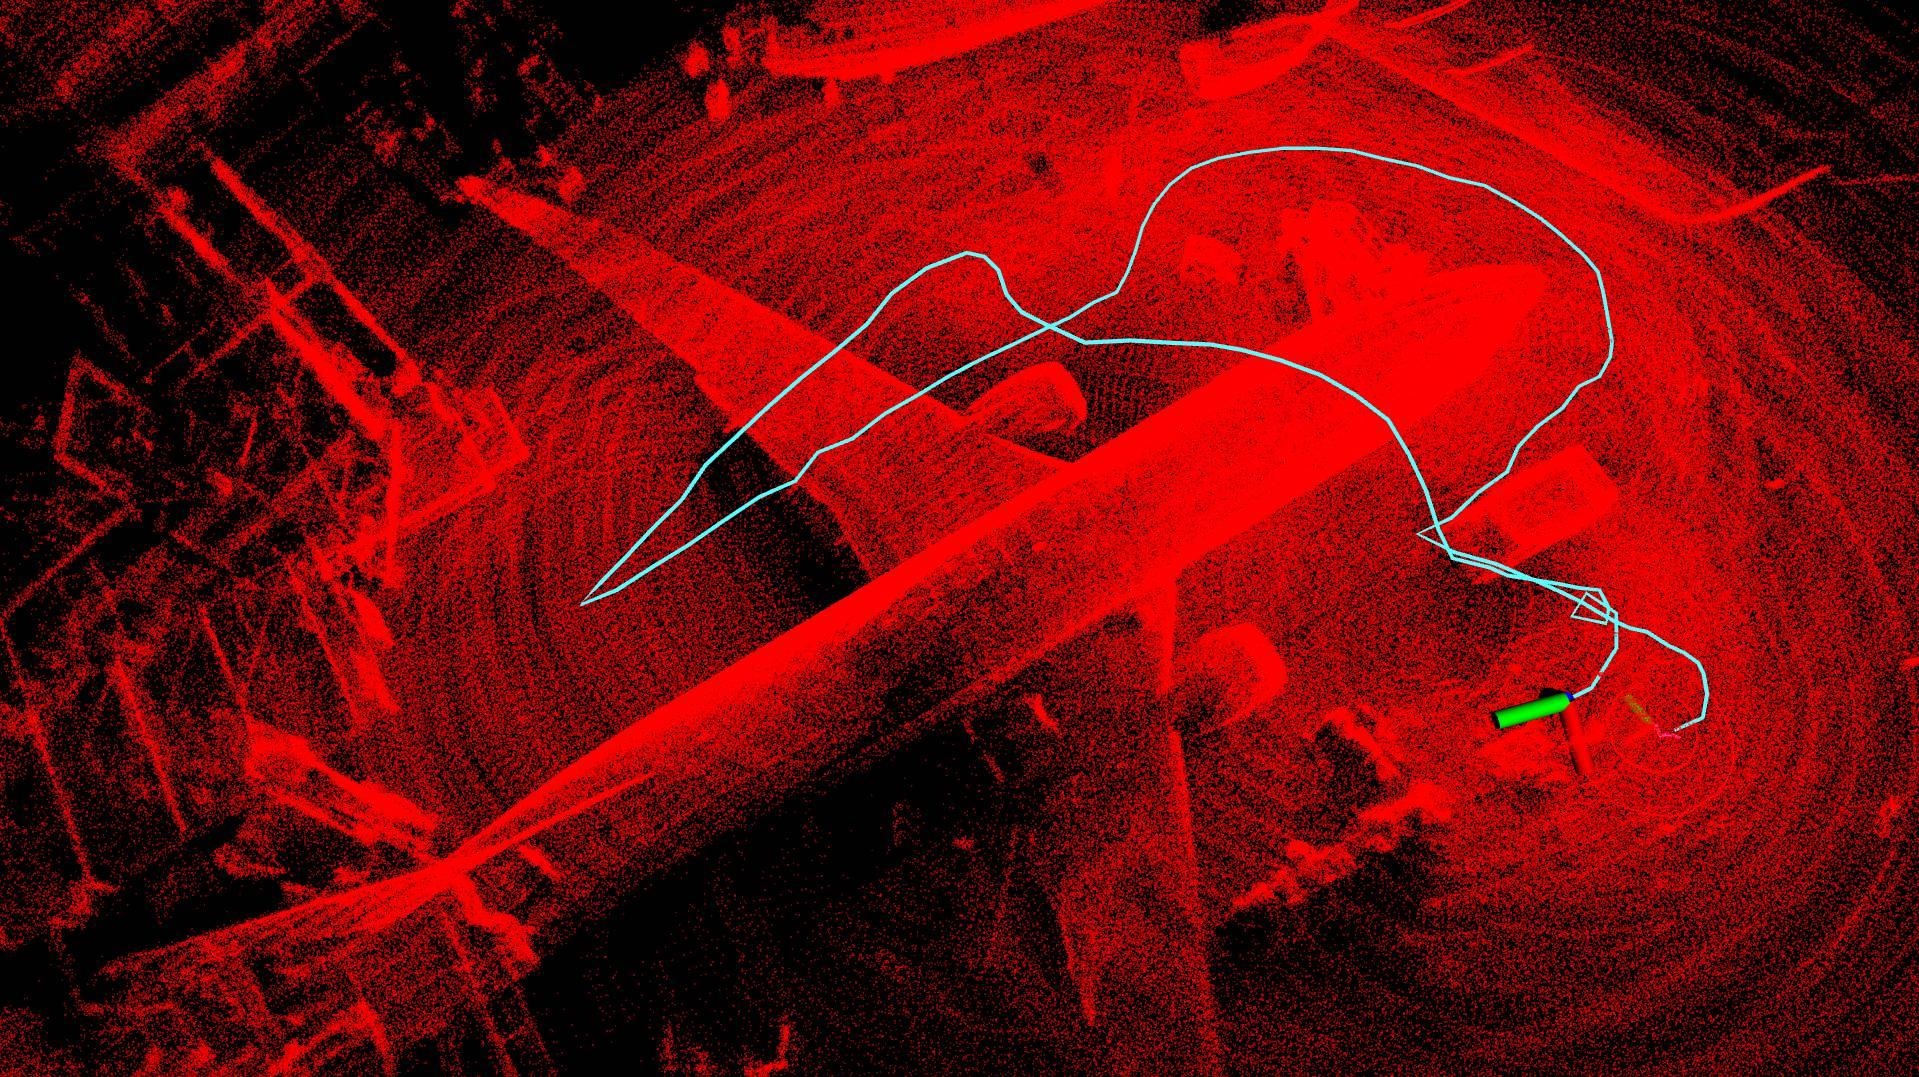 aircraft drone inspection lidar path